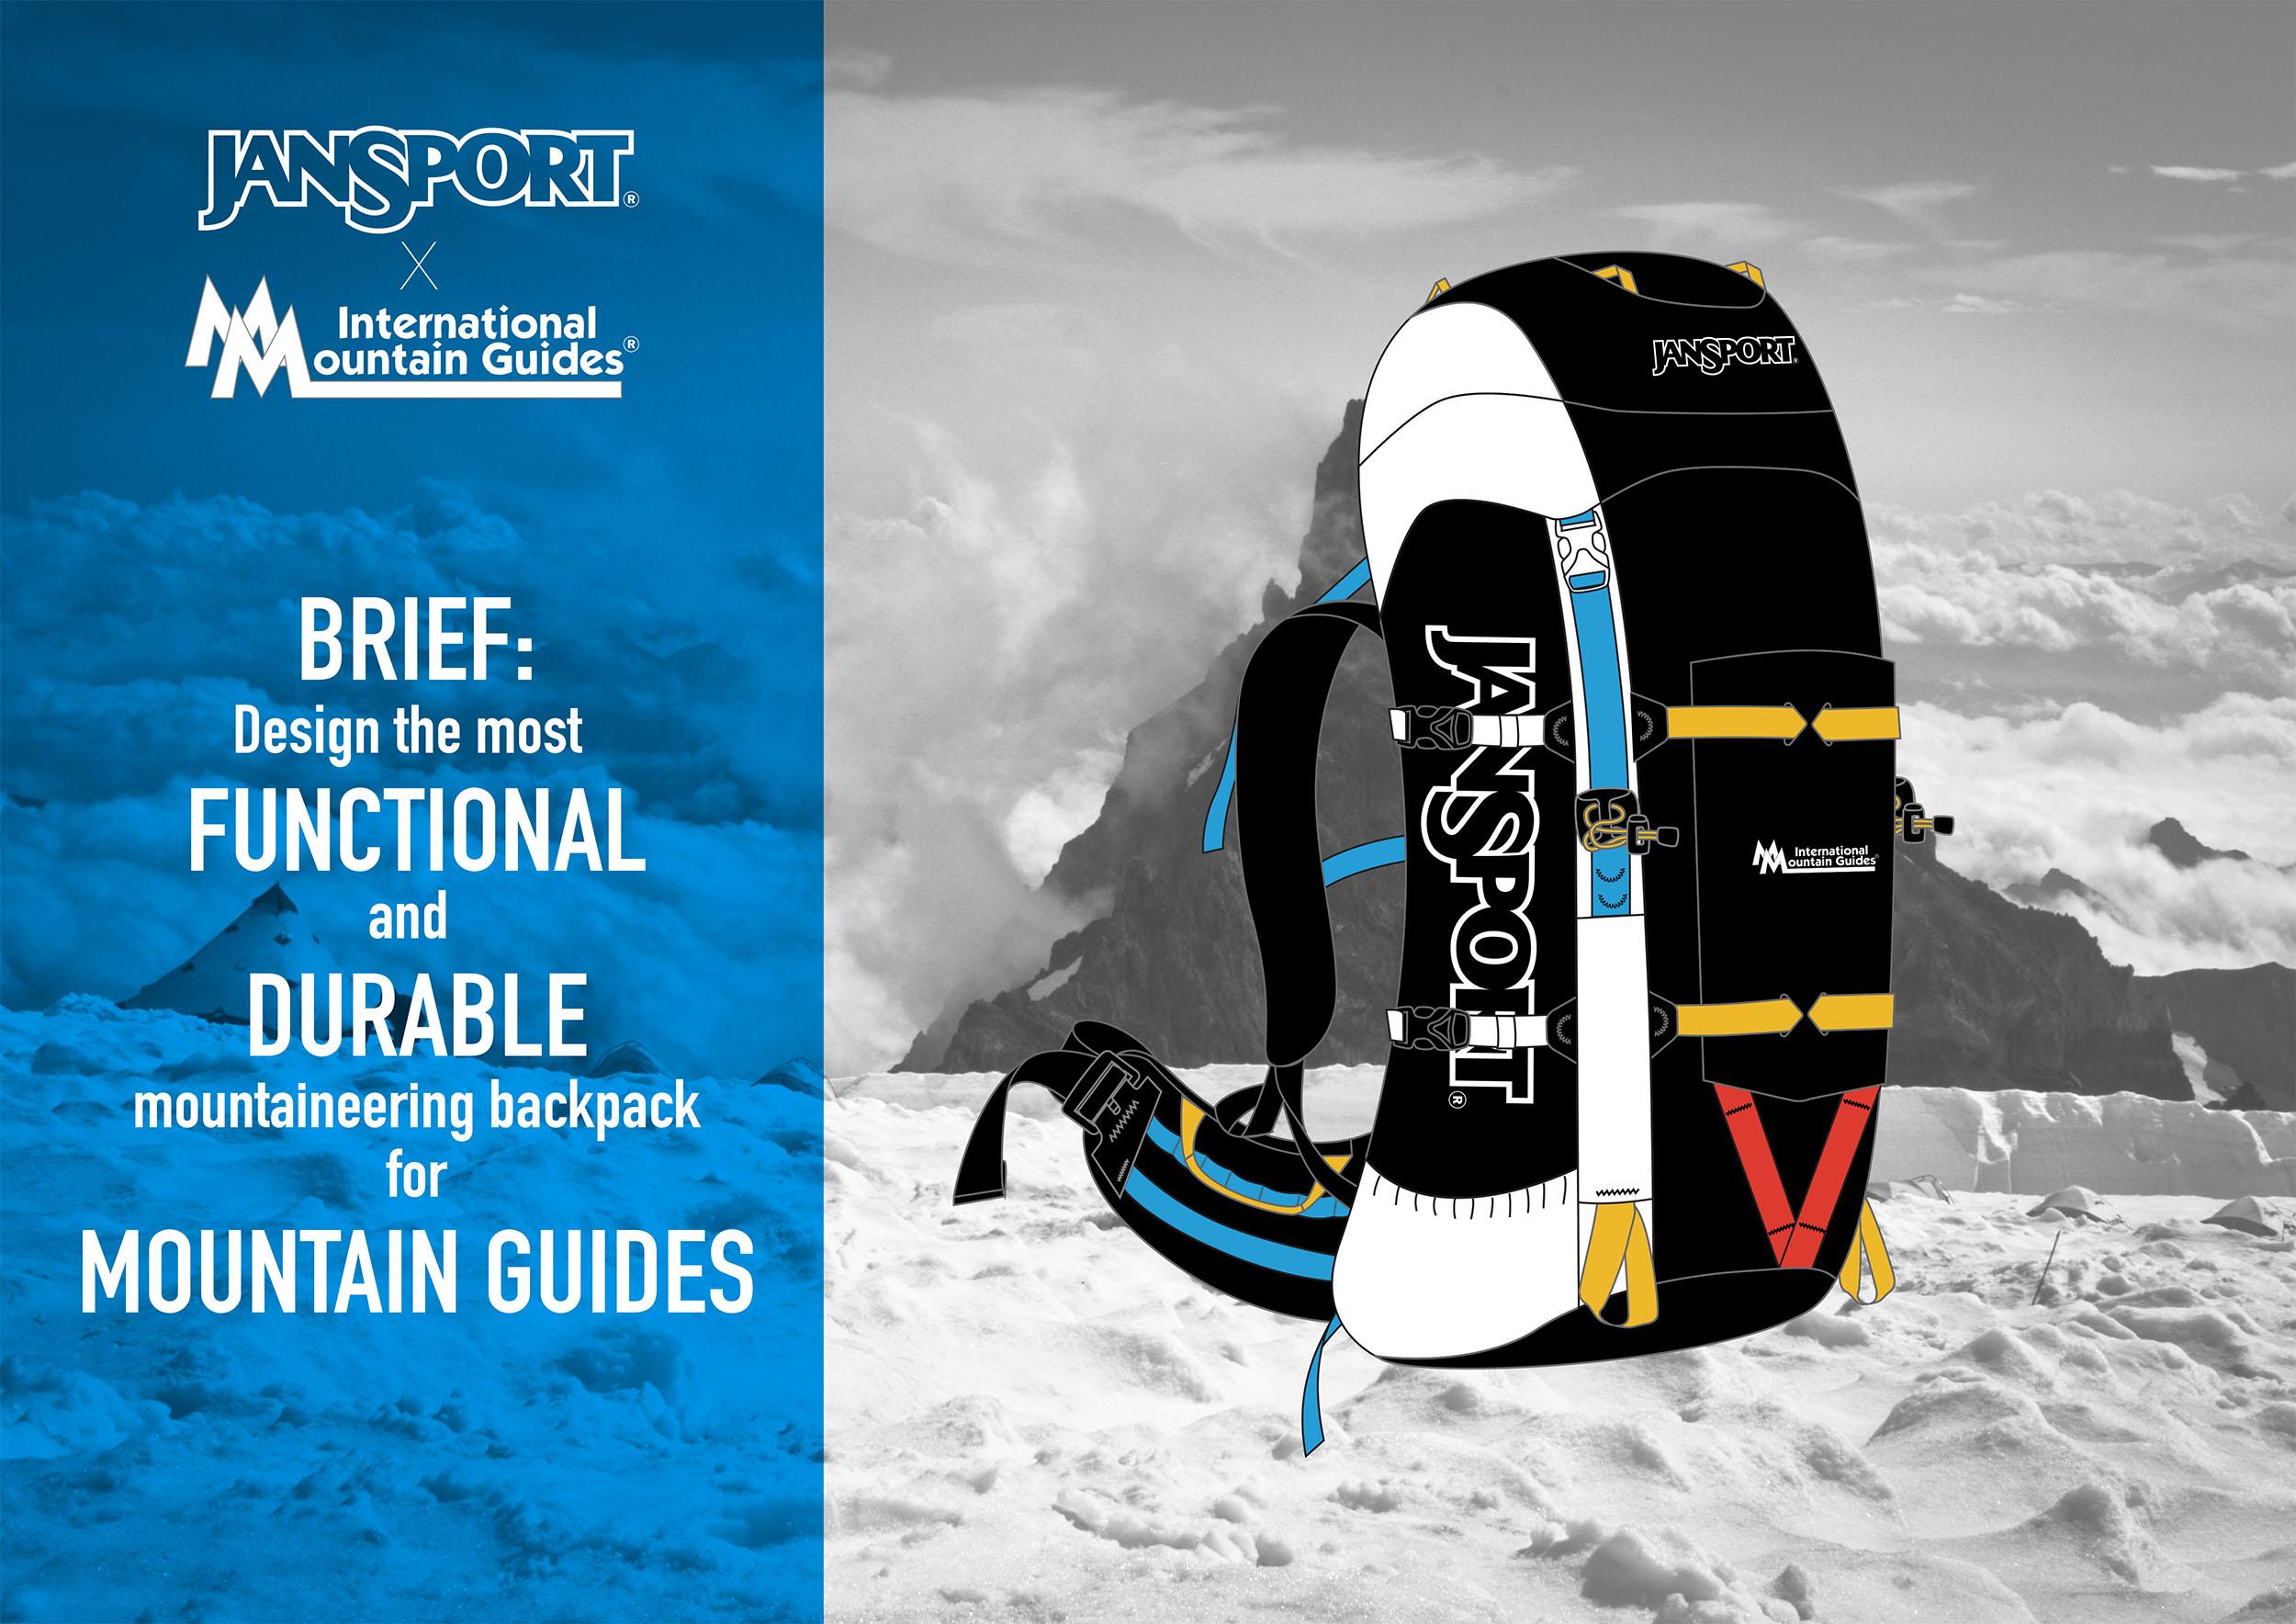 International Mountain Guides Backpack Design